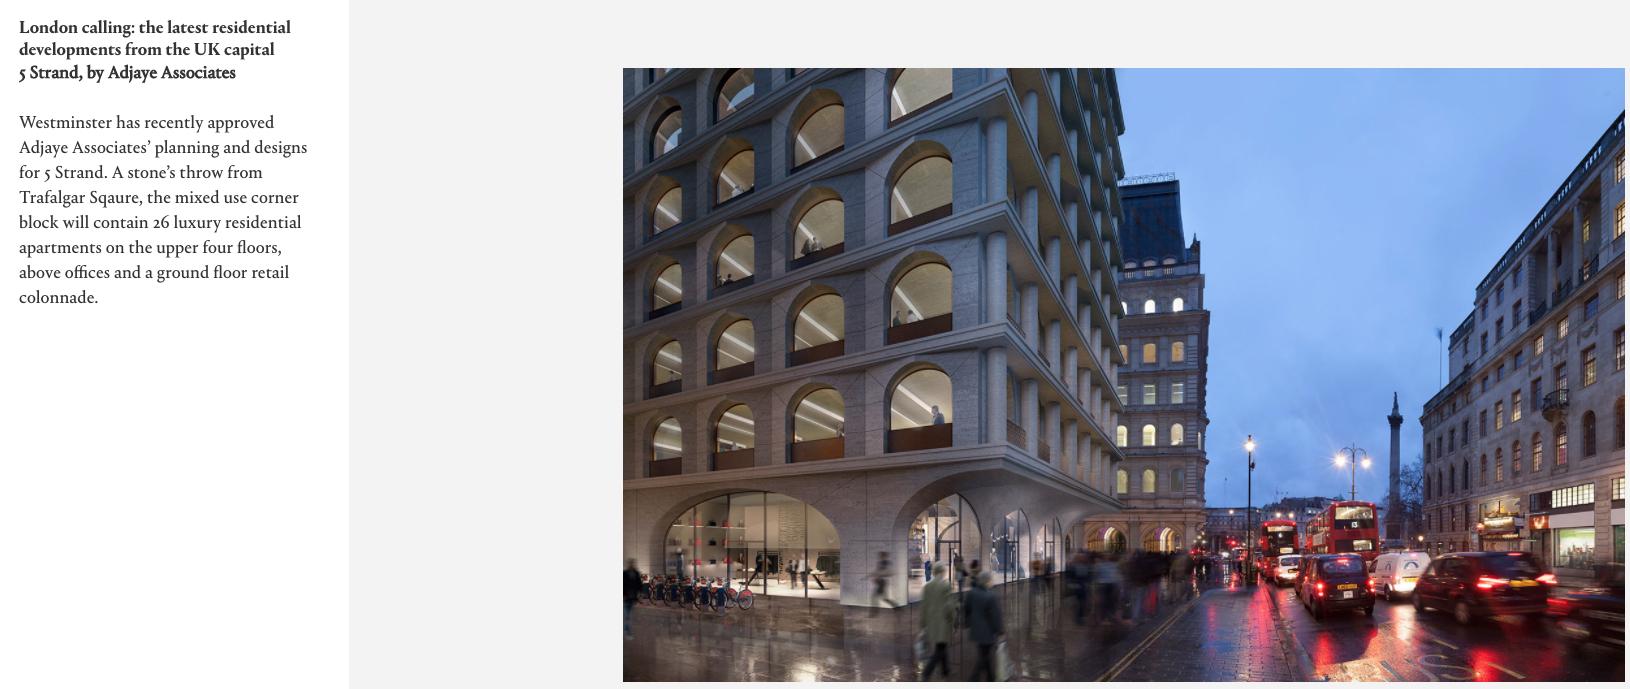 London calling: the latest residential developments from the UK capital | Wallpaper* 2017-10-30 13-47-18.jpg